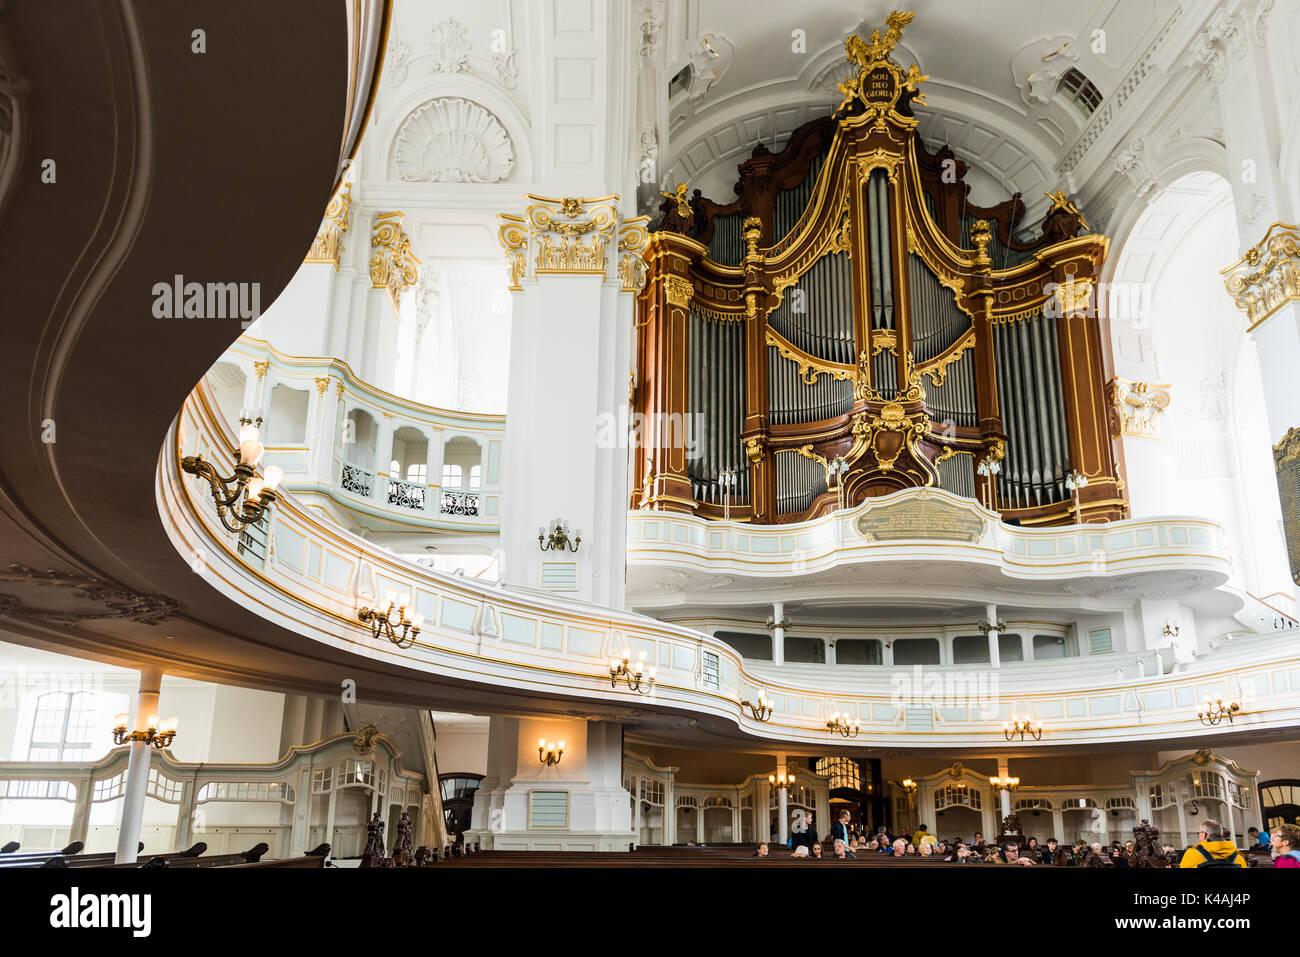 A J Hamburg organ interior view st michaelis church also hamburger michel